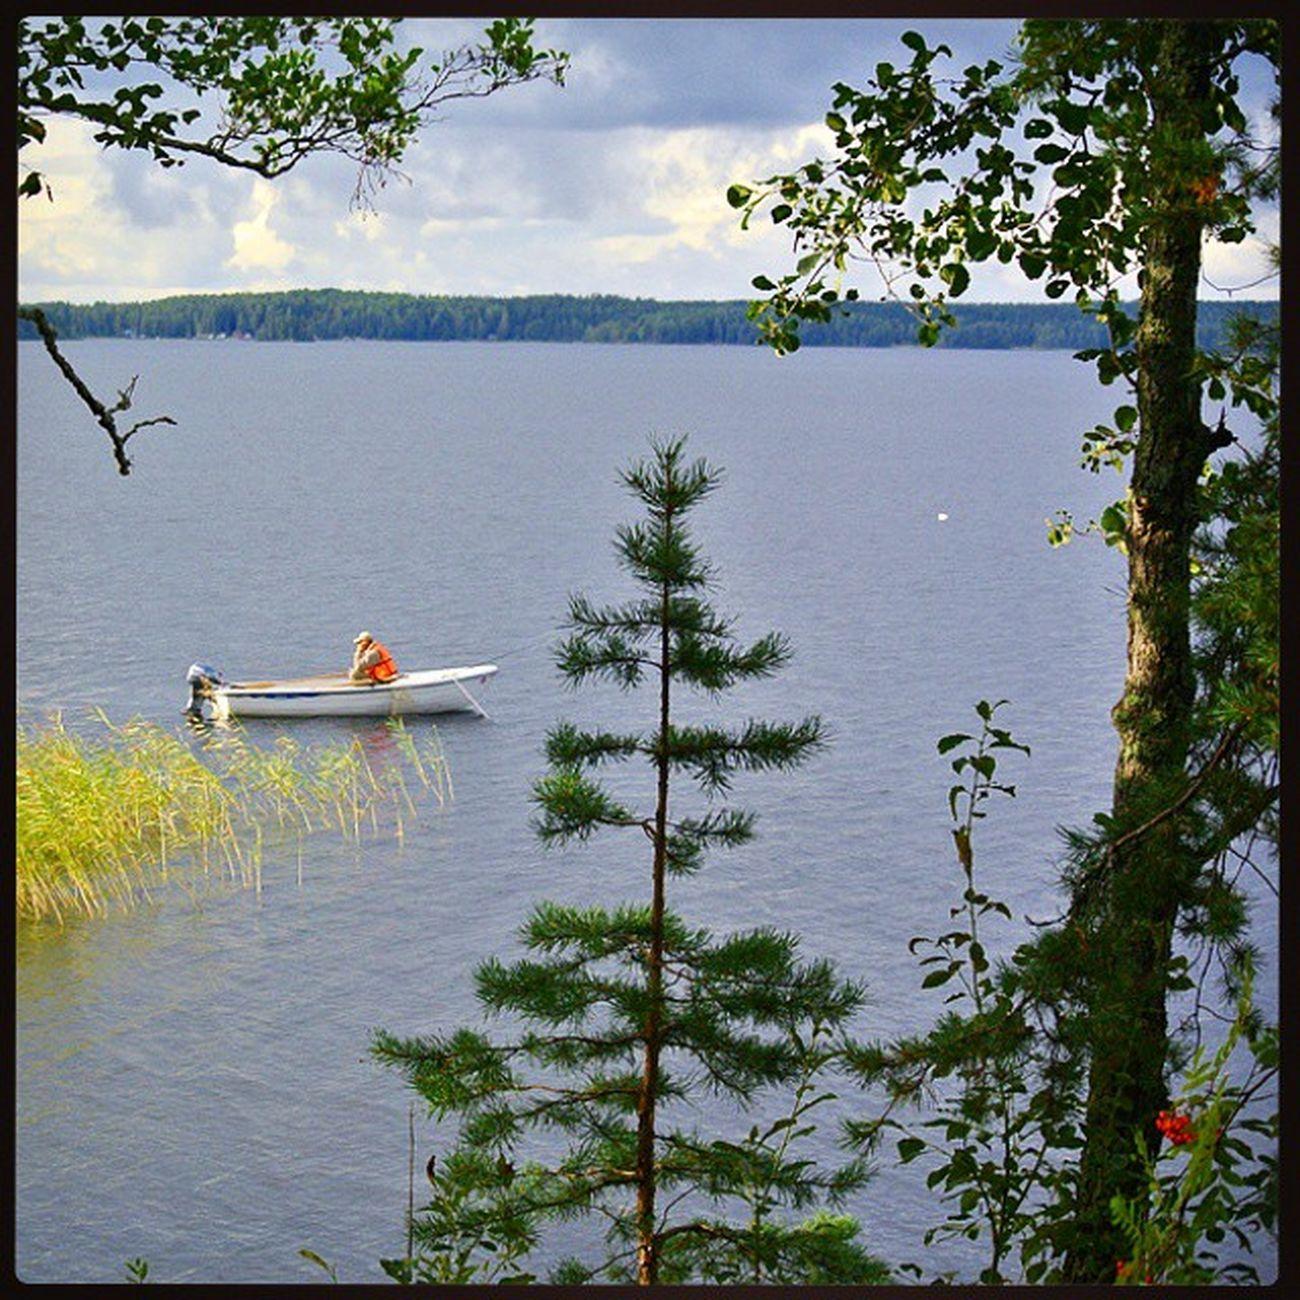 Saimaa Finland Fishing Lake nature relax summer trees Финляндия Саймаа рыбак рыбалка озеро лодка лето Suomi природа деревья отдых красота